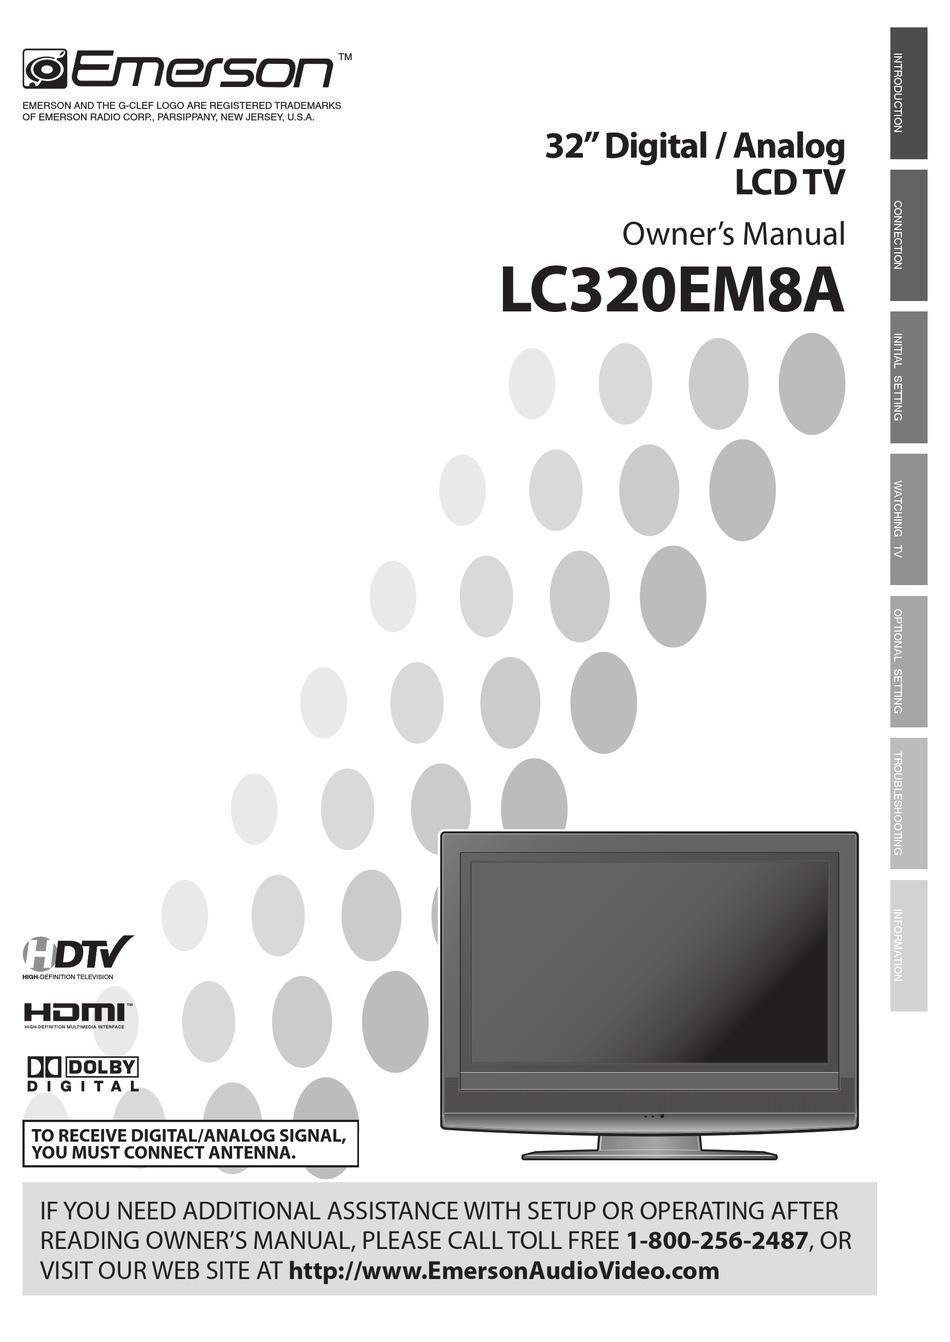 Emerson Lc320em8a Owner S Manual Pdf Download Manualslib